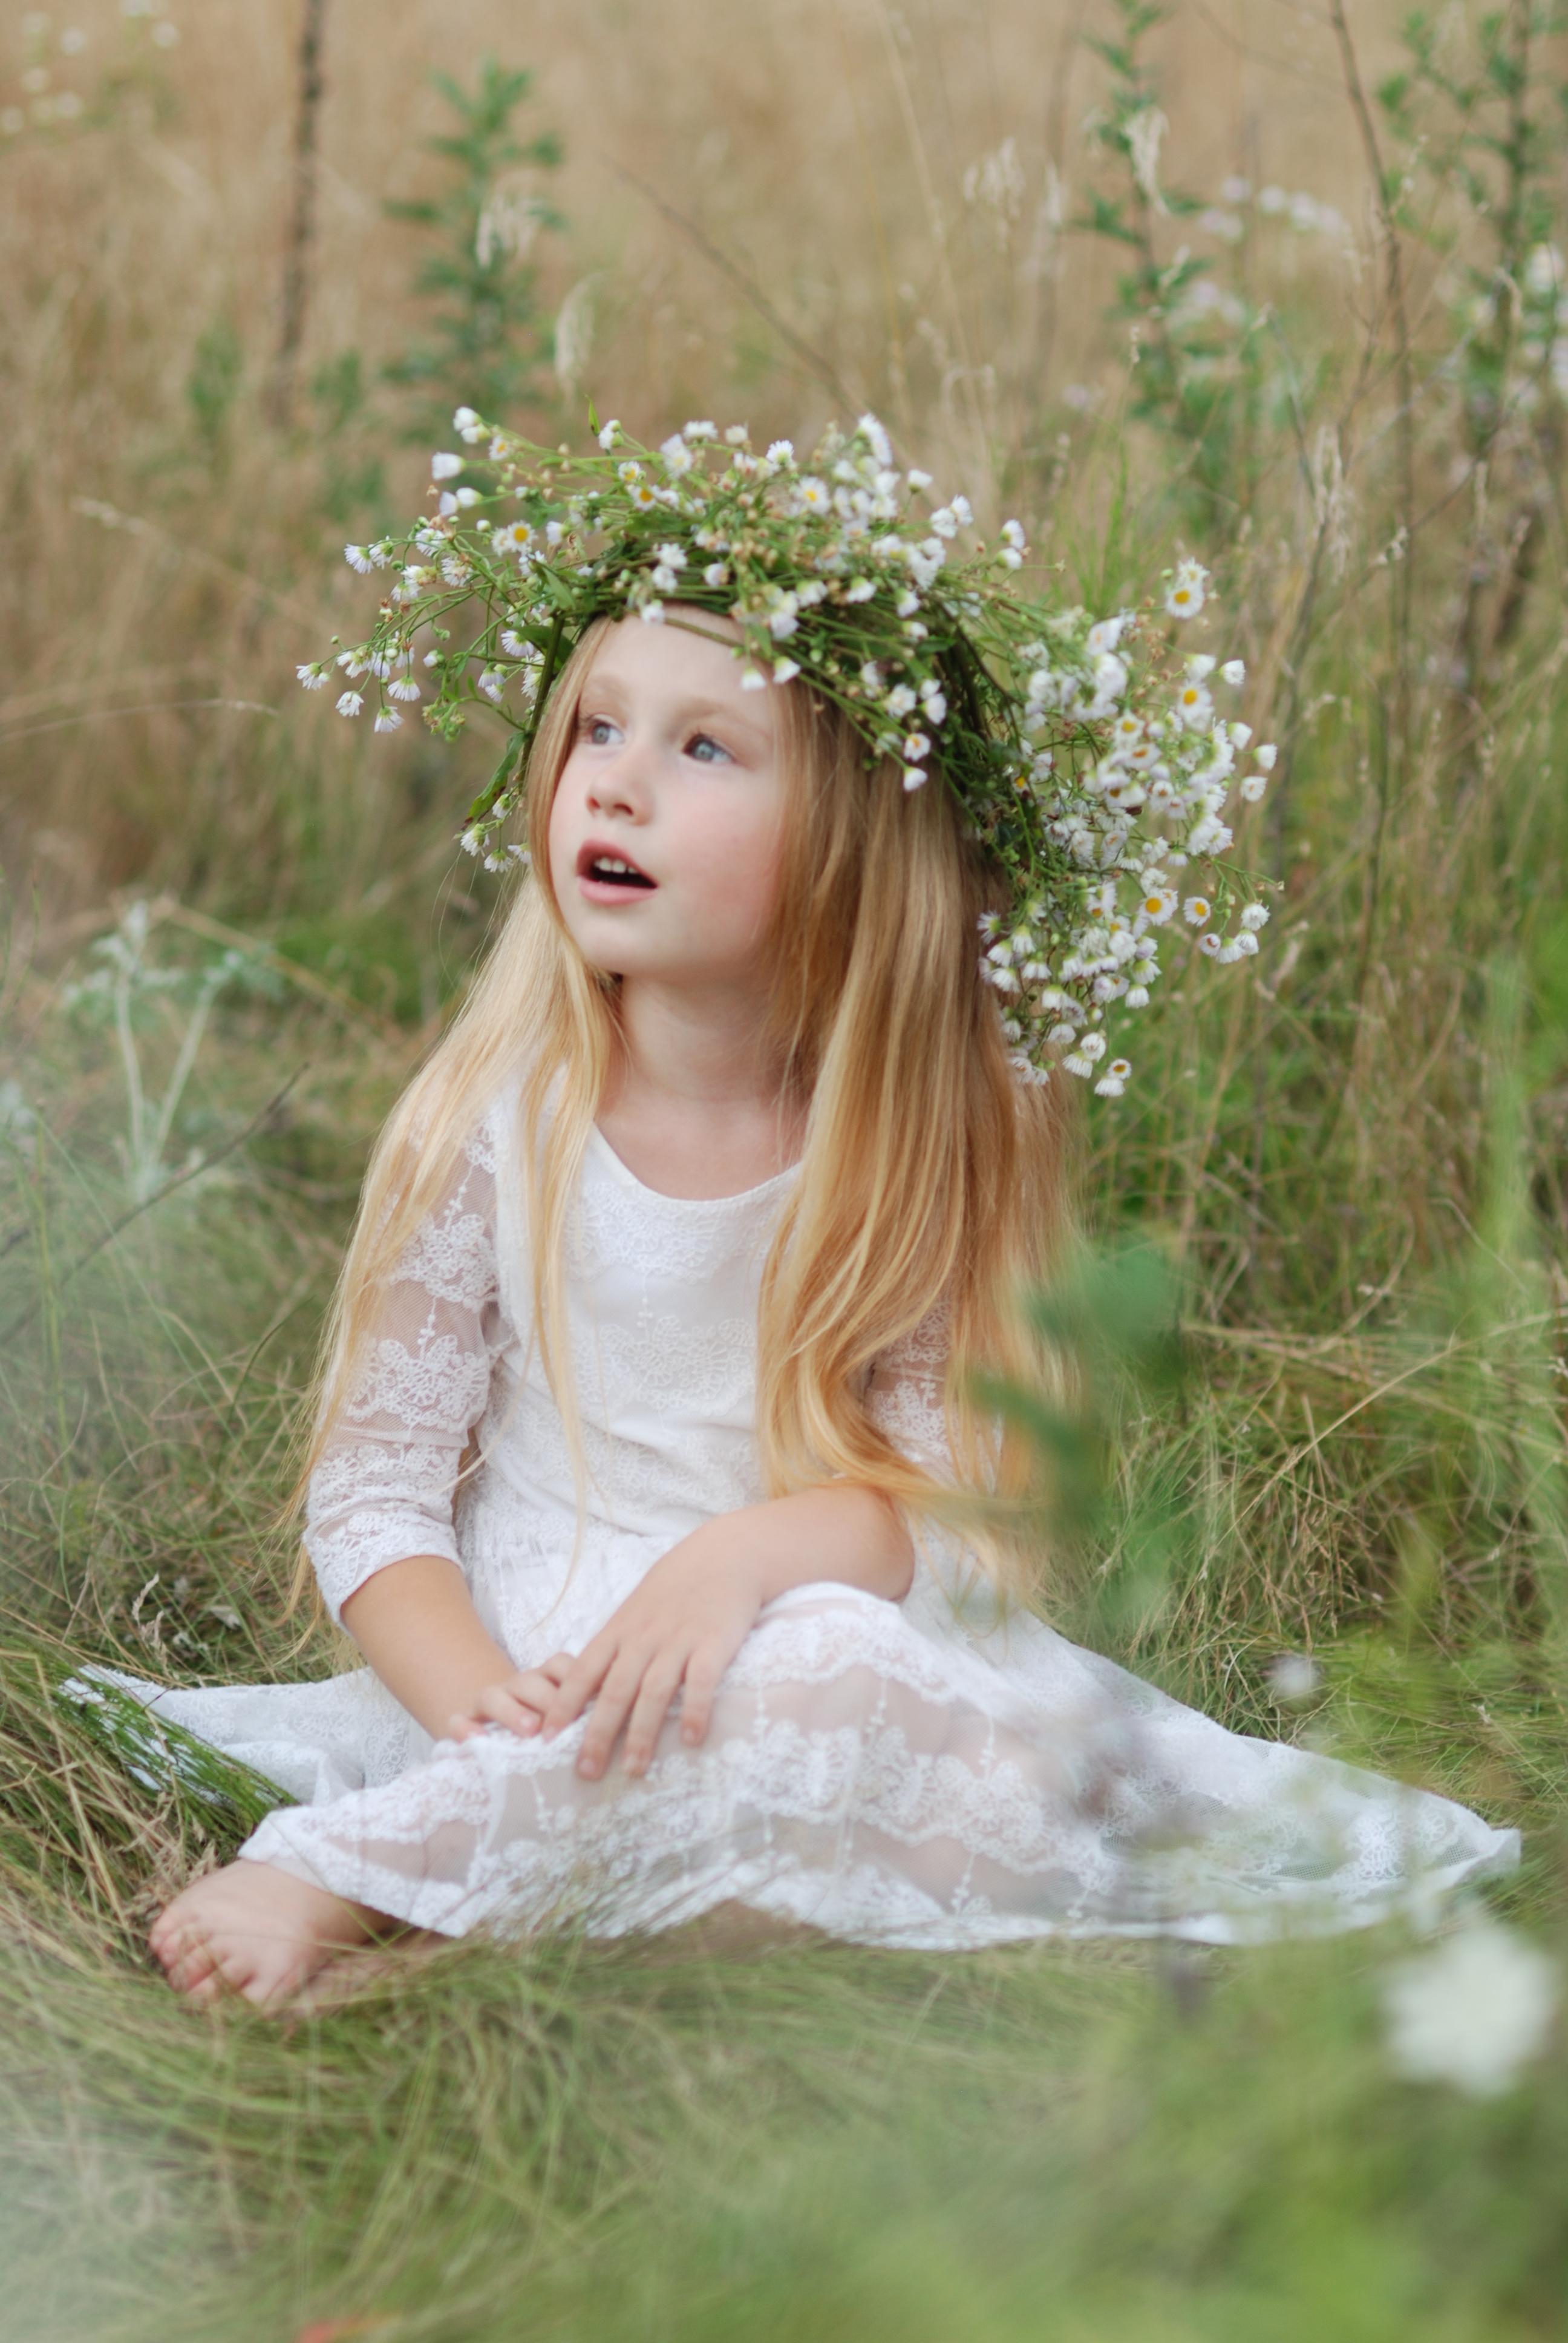 Little Forest Fairy_1 by anastasiya-landa